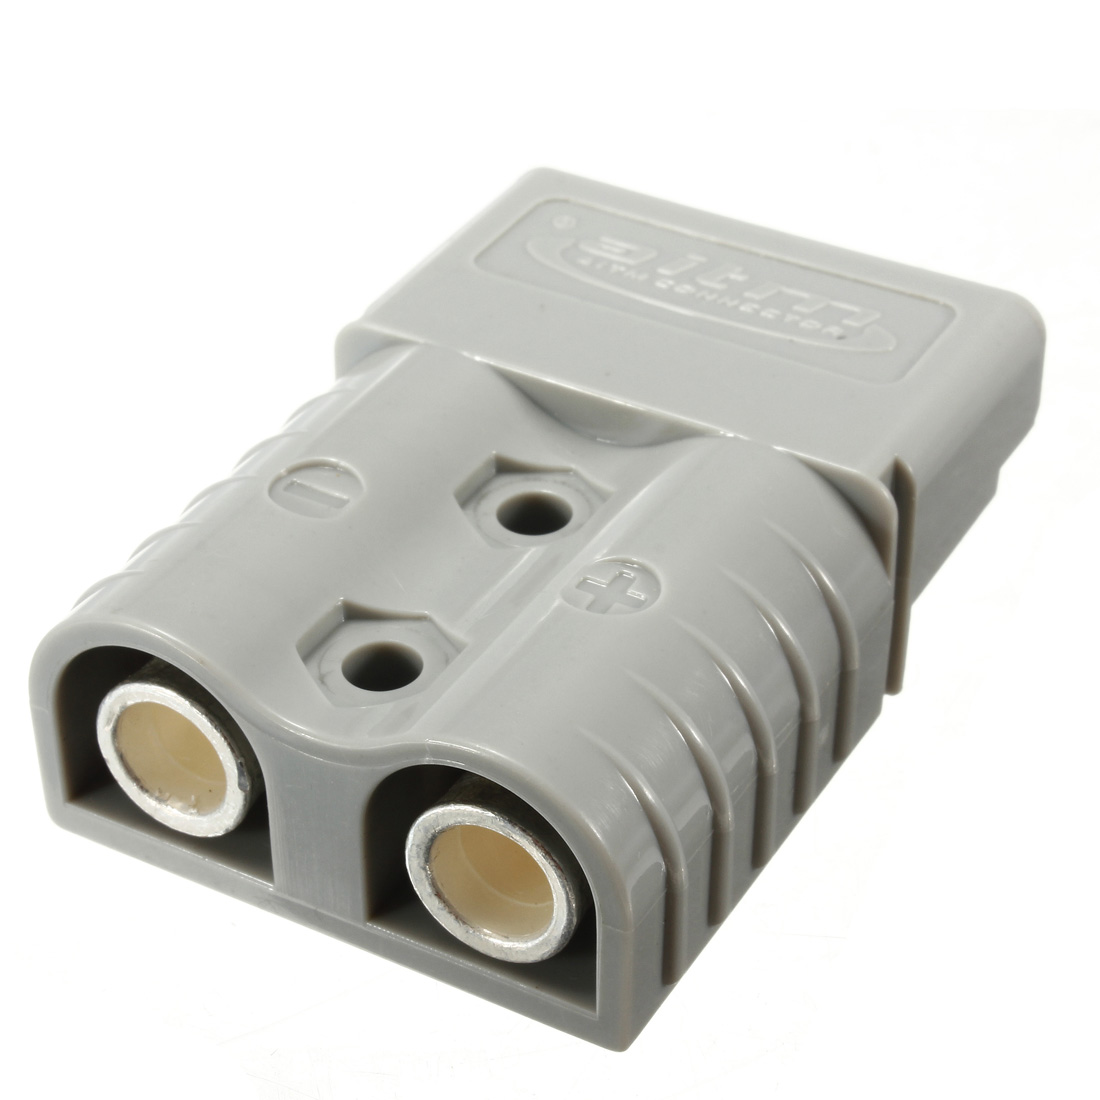 8623CFCECBCF3313CBBE13C81383334313CCCA23F5CD battery quick connect wire harness plug www toyskids co \u2022